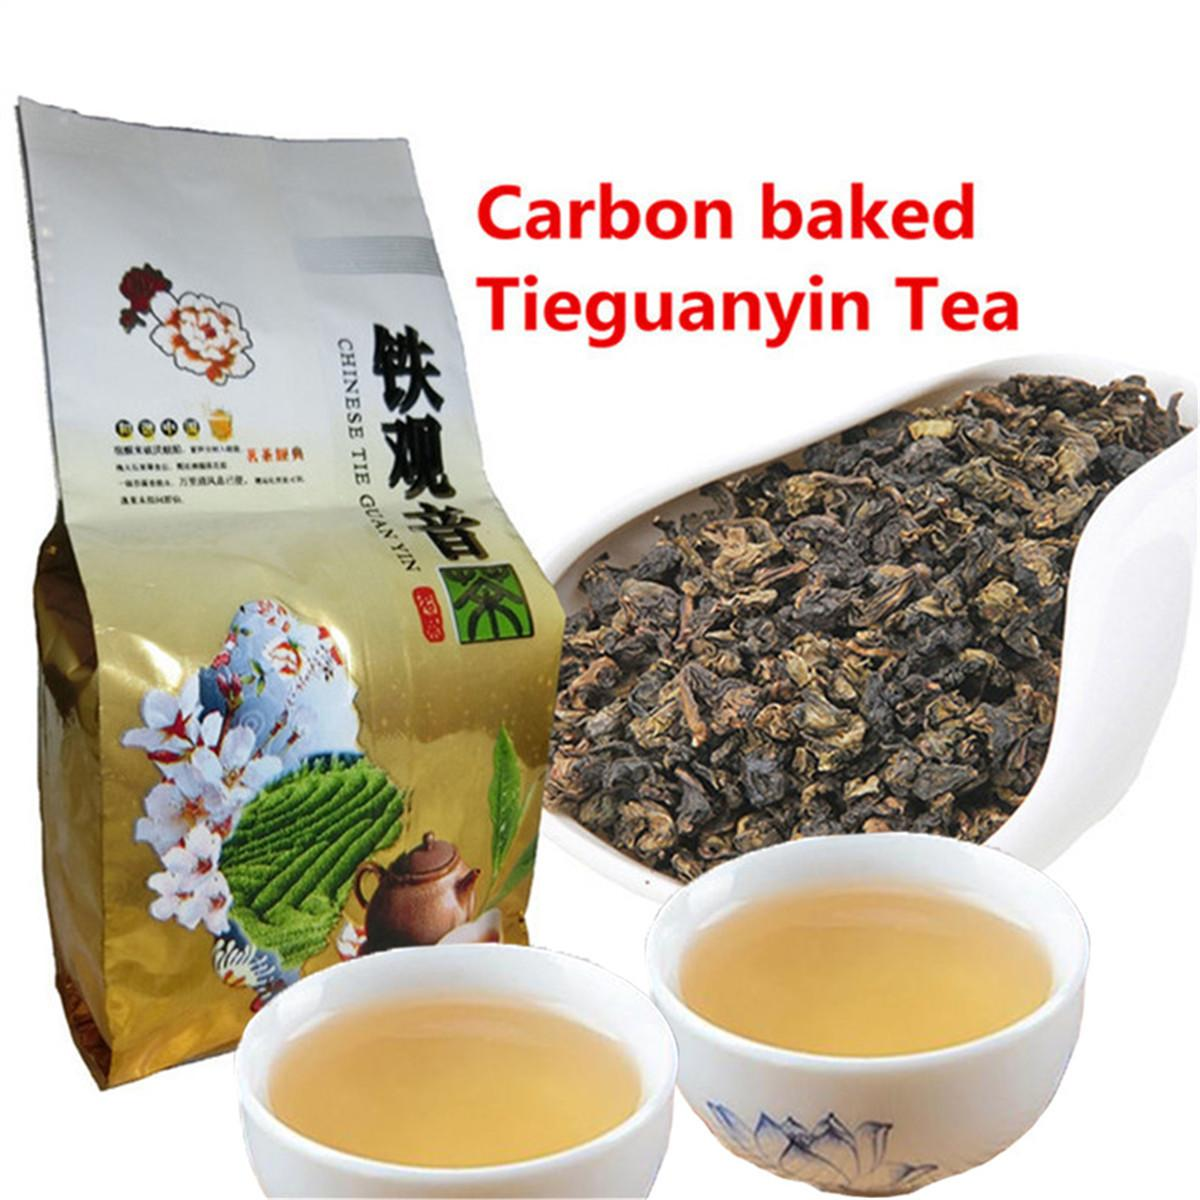 50g Çin Organik Oolong çayı Doğal Karbon Specaily Tieguanyin Oolong Yeşil çay Yeni Bahar çay Yeşil Gıda Sıcak satış